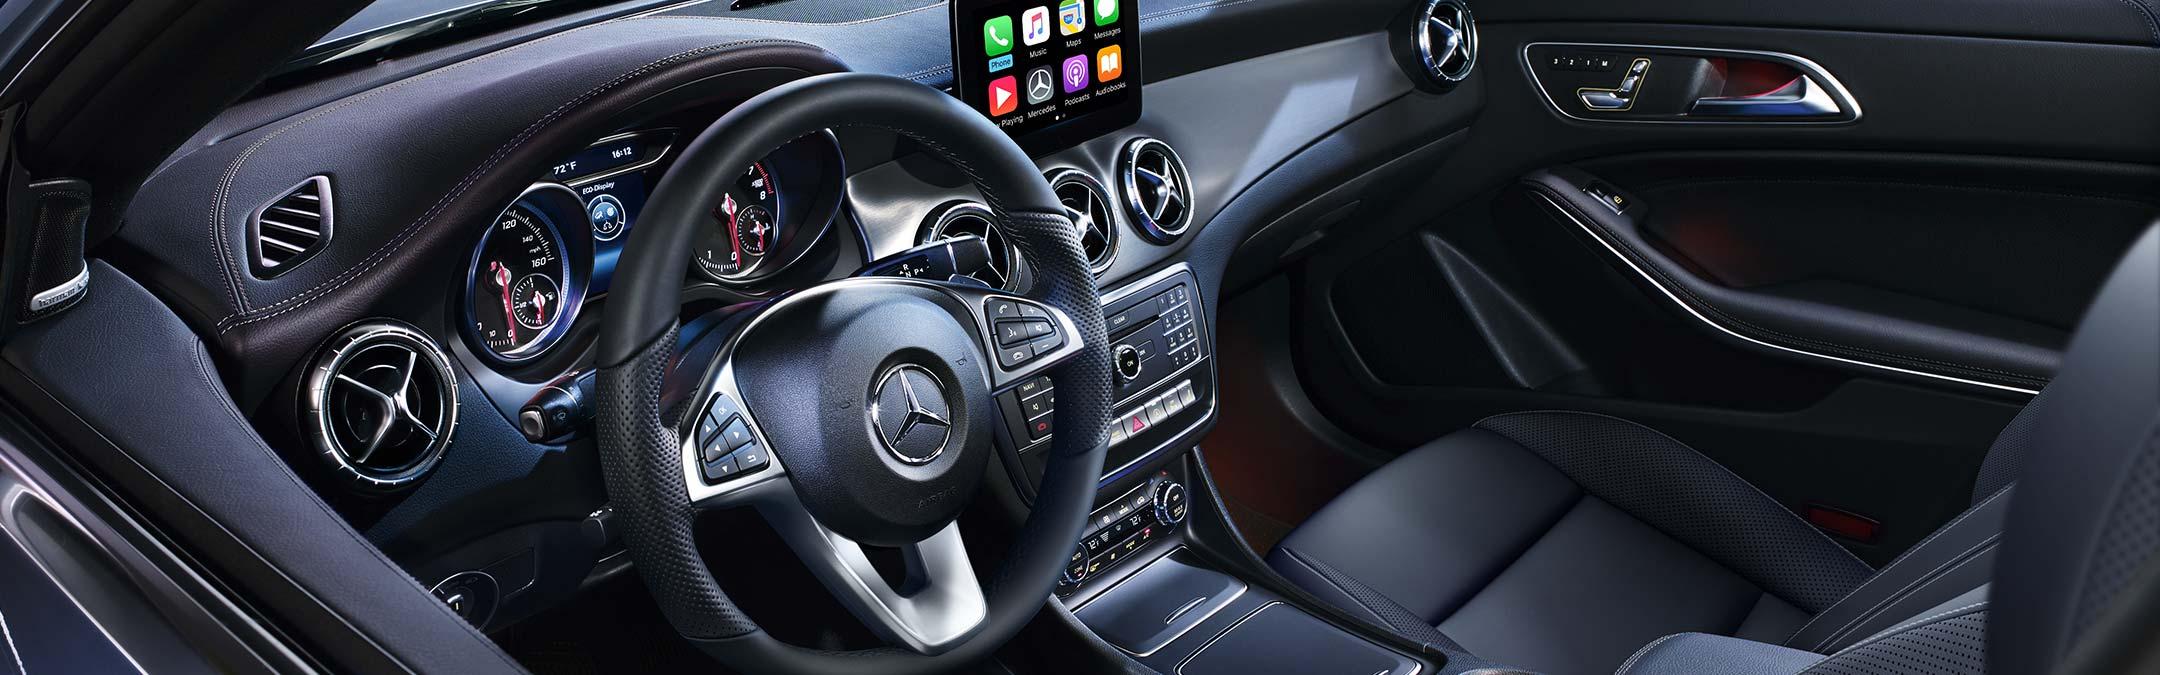 2019 Mercedes Benz Cla Sedan Mercedes Cla Coupe For Sale